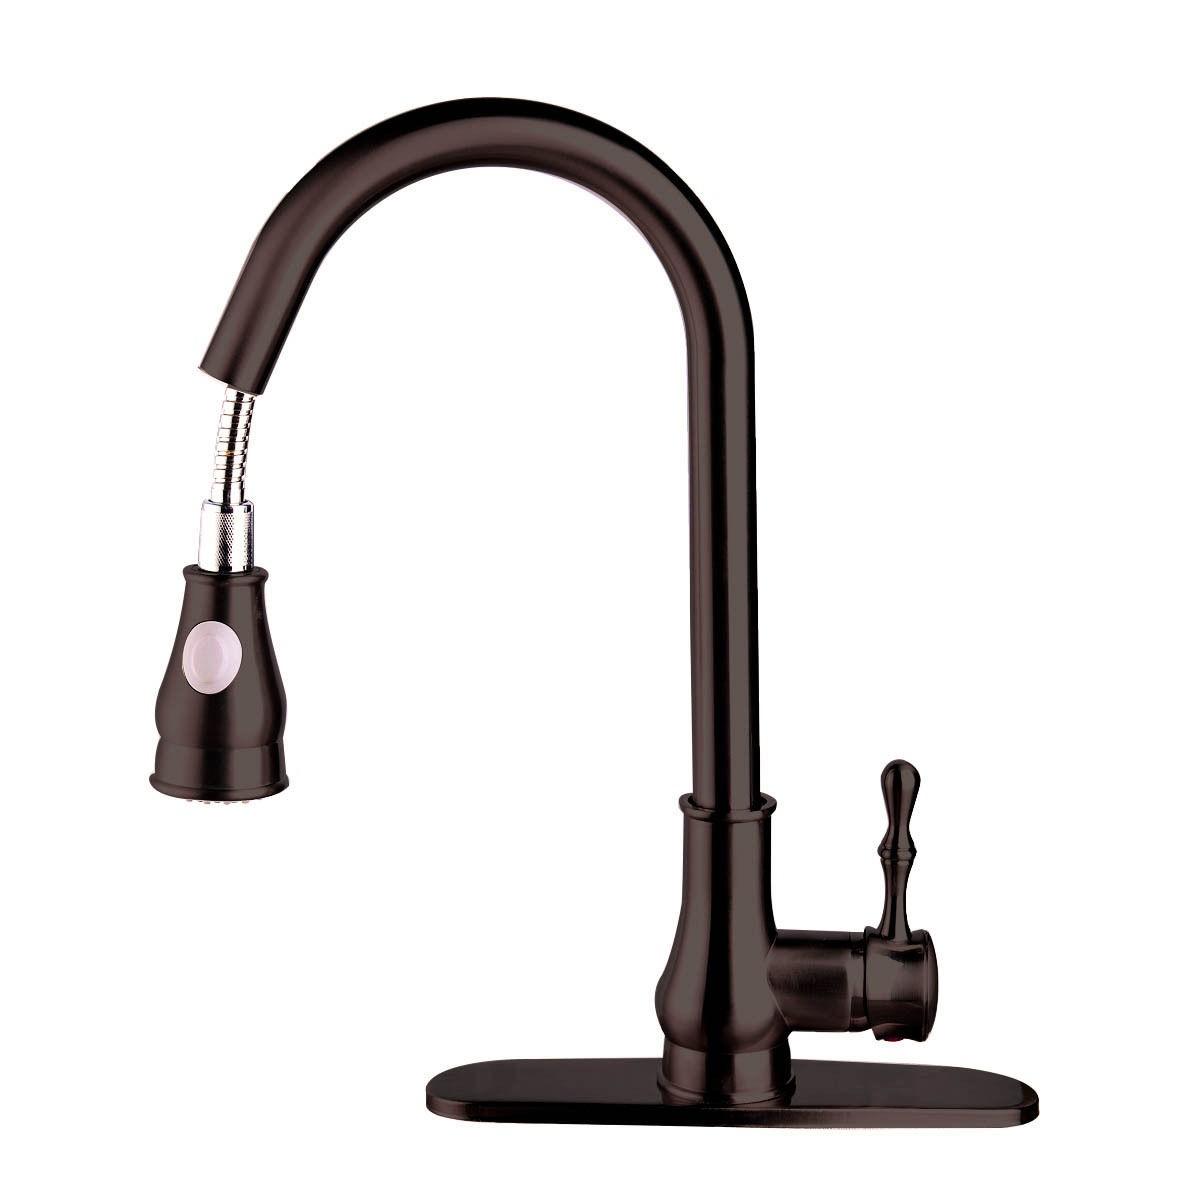 Dark Brown Pull Out Spray 16 Kitchen Sink Faucet Swivel Spout Dispenser